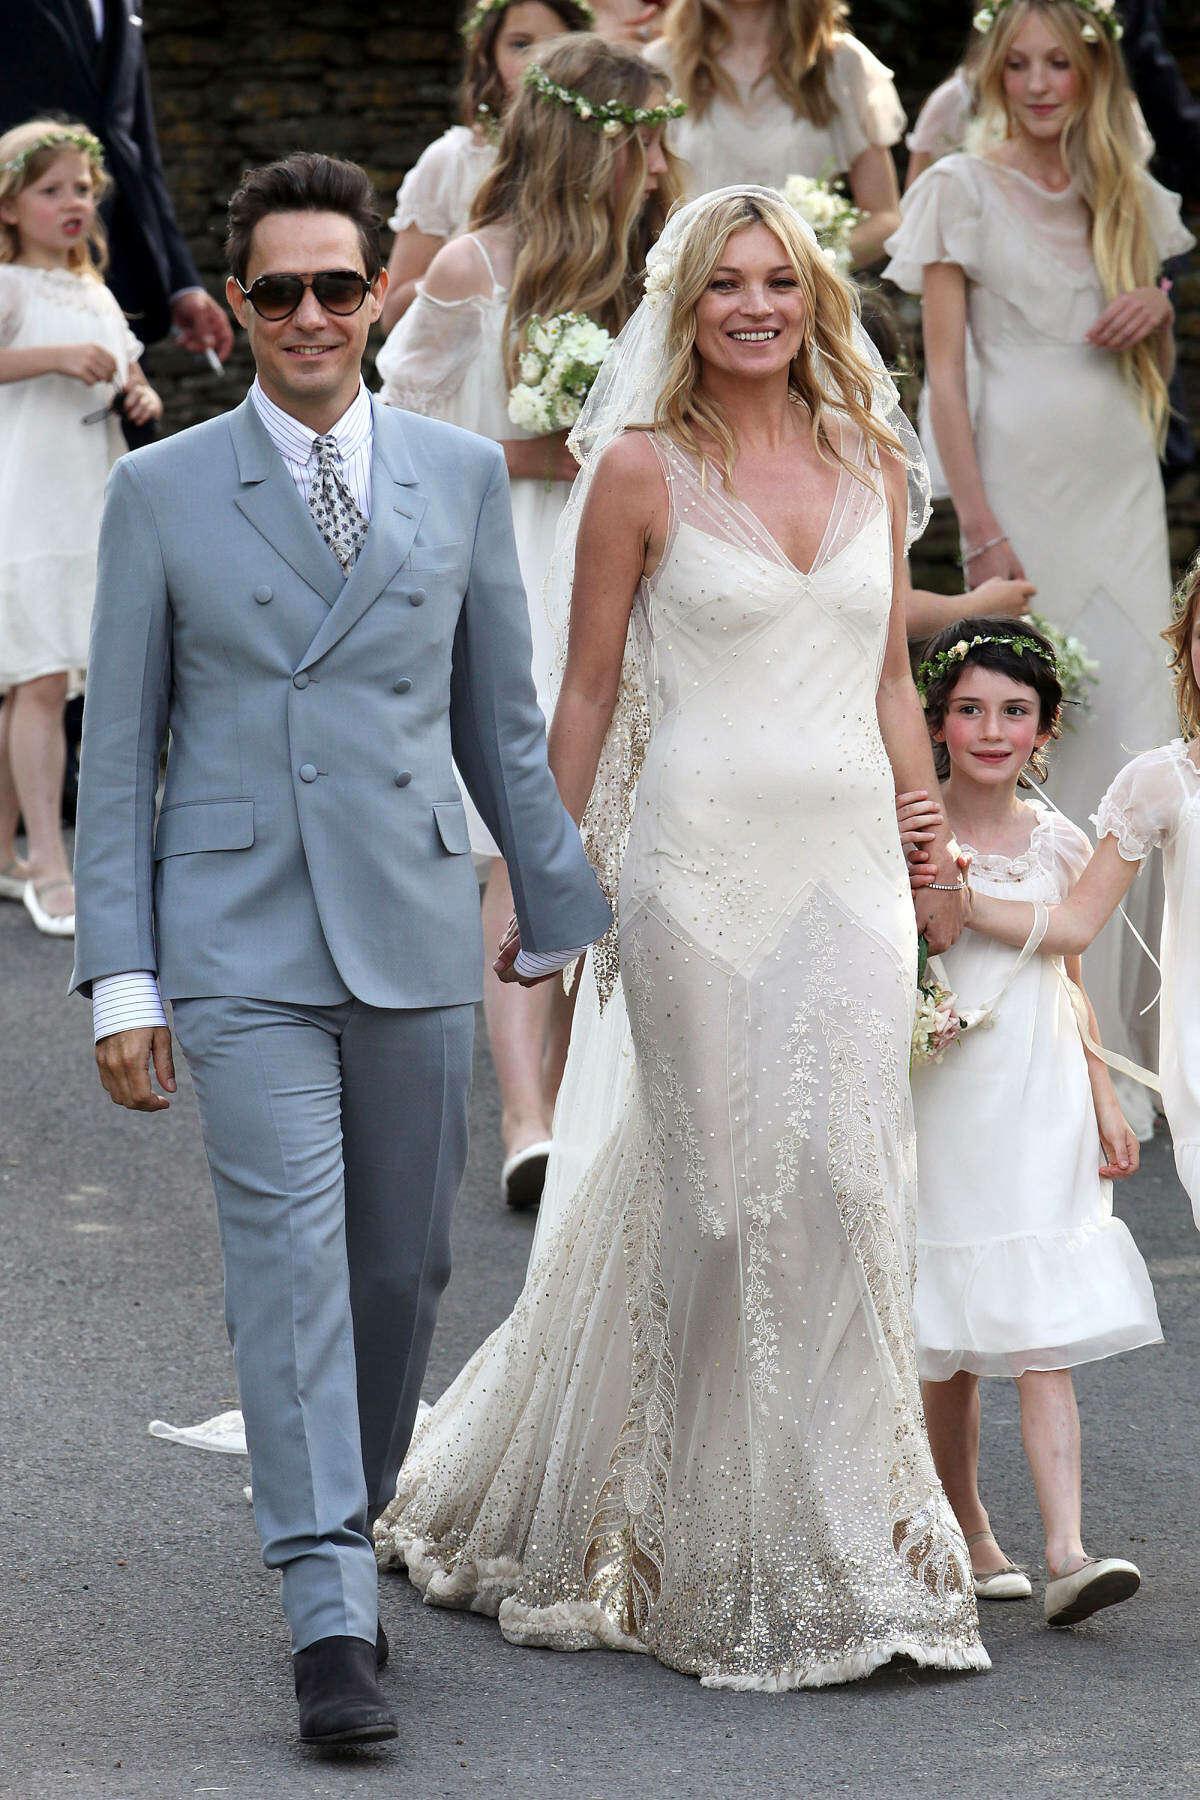 Kate Moss married Jamie Hince on July 1, 2011.